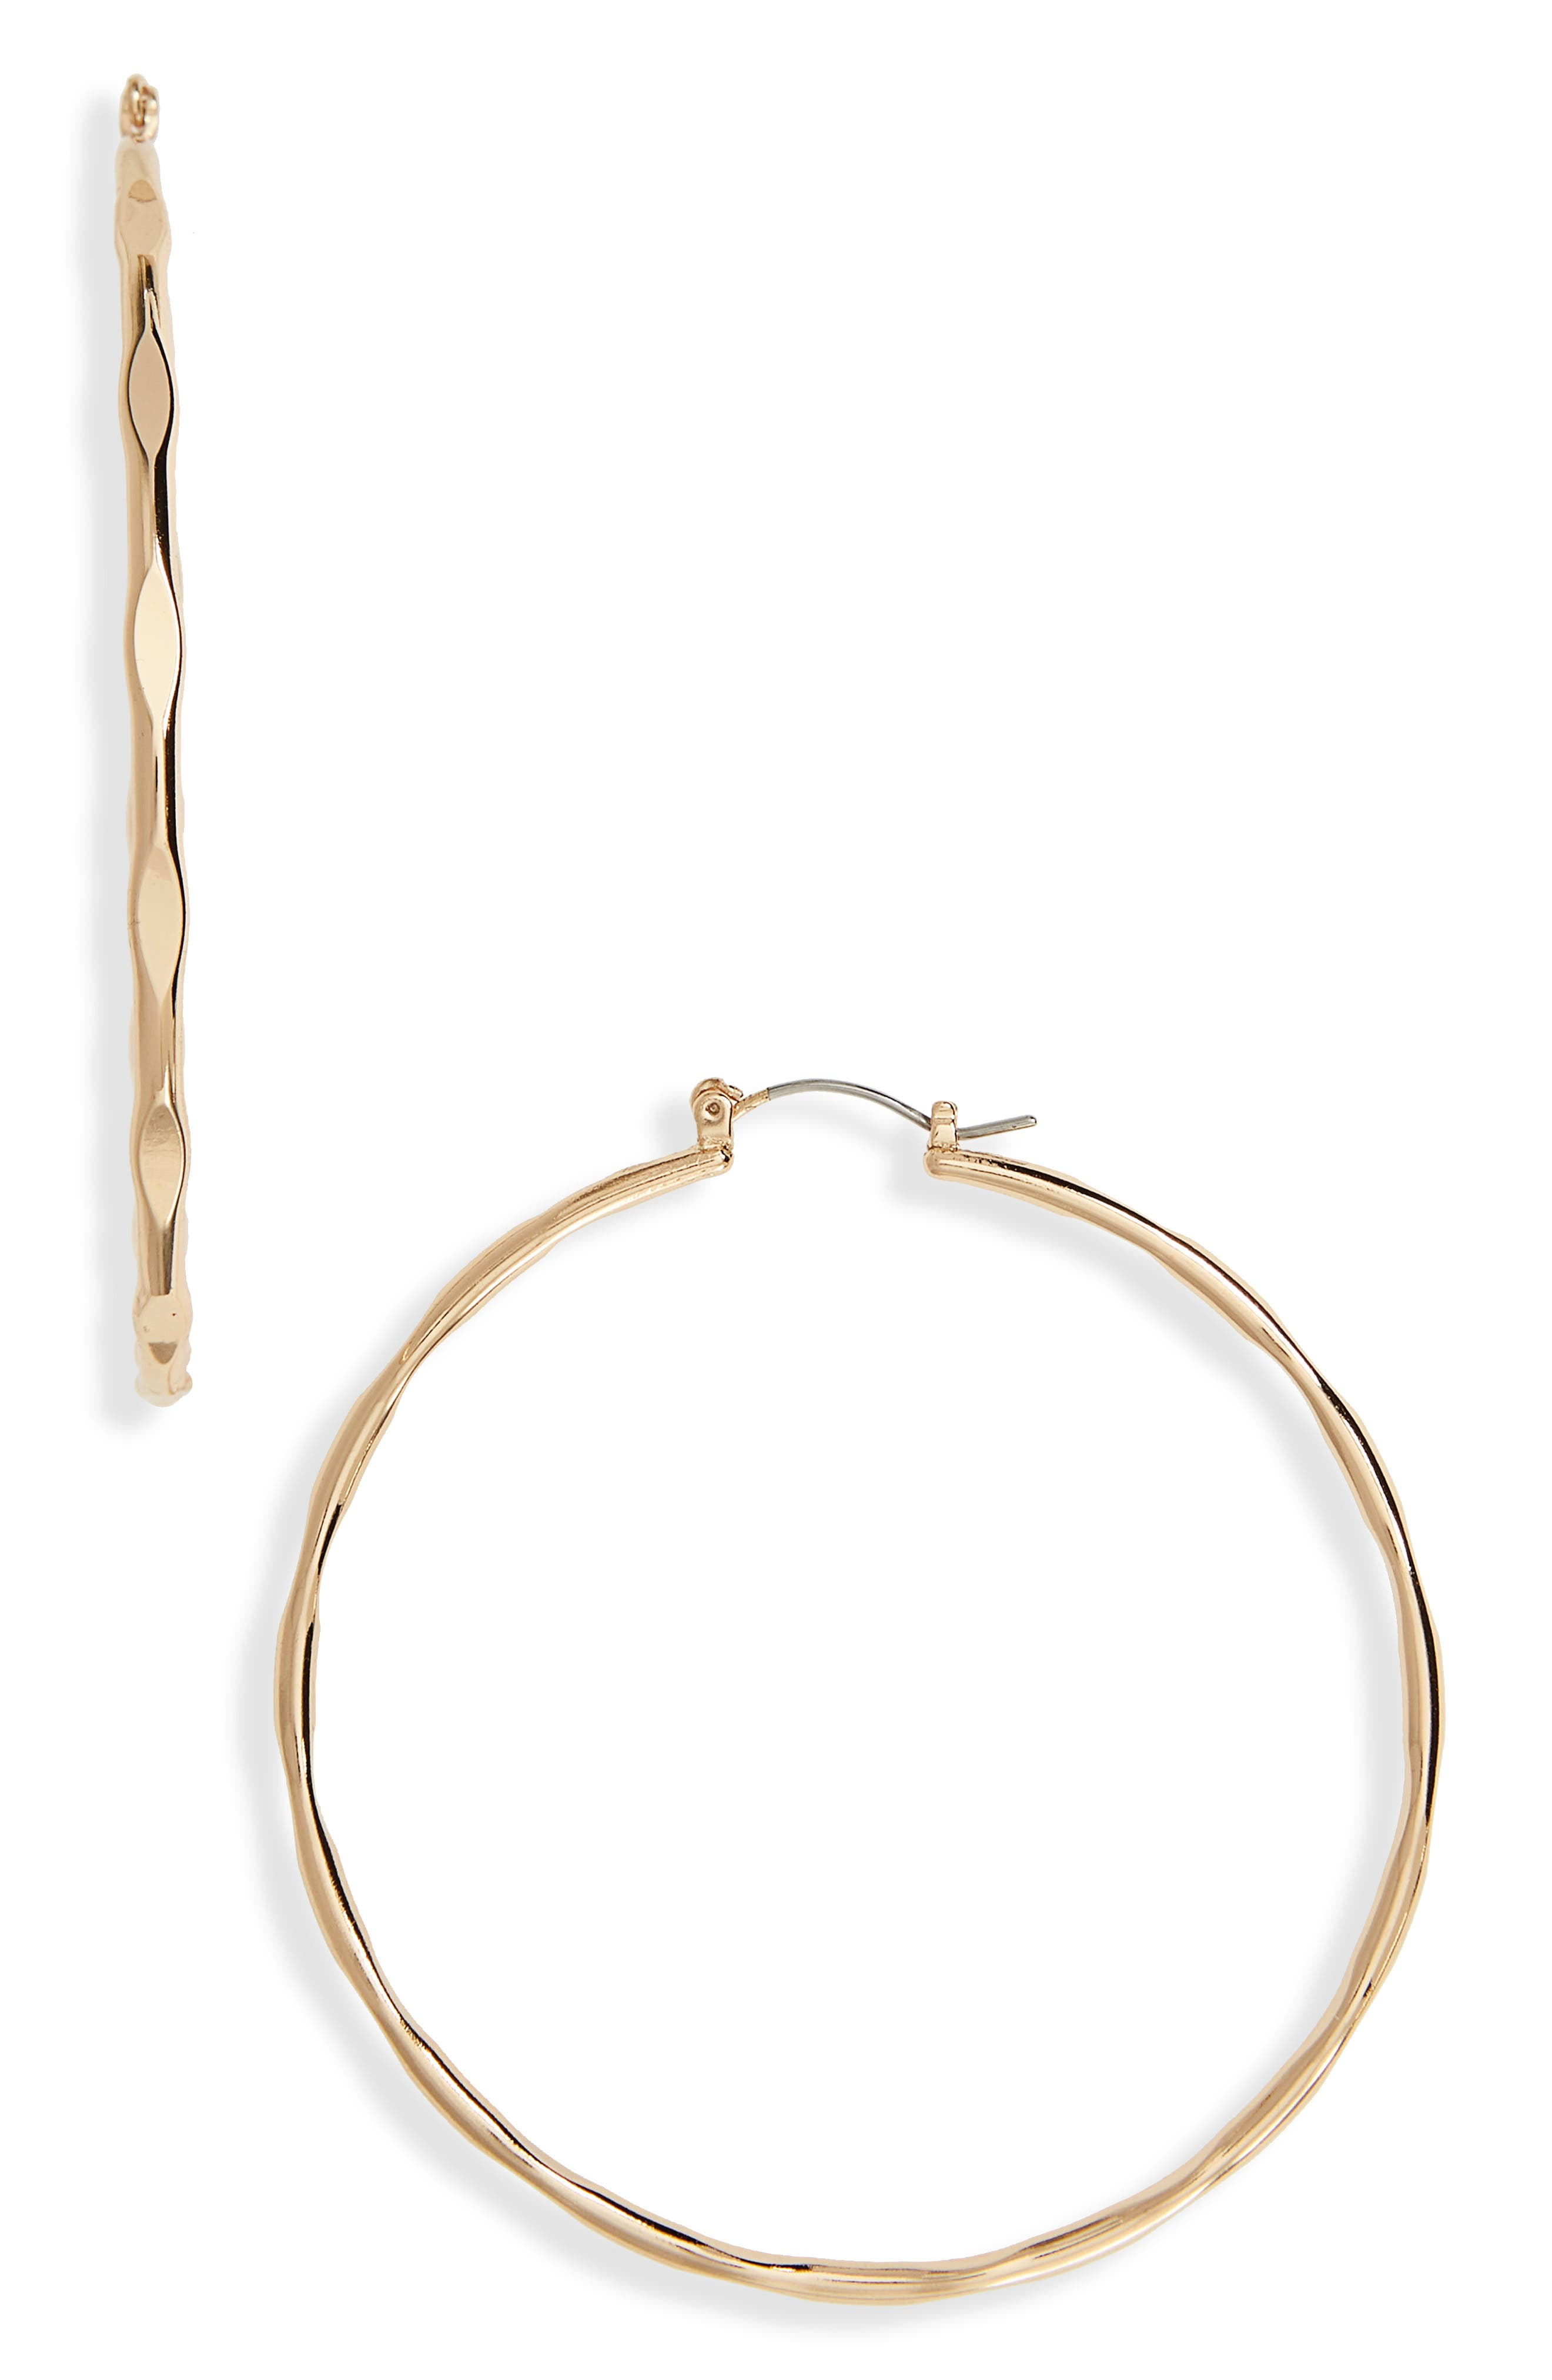 Large Hoop Earrings,                             Main thumbnail 1, color,                             710